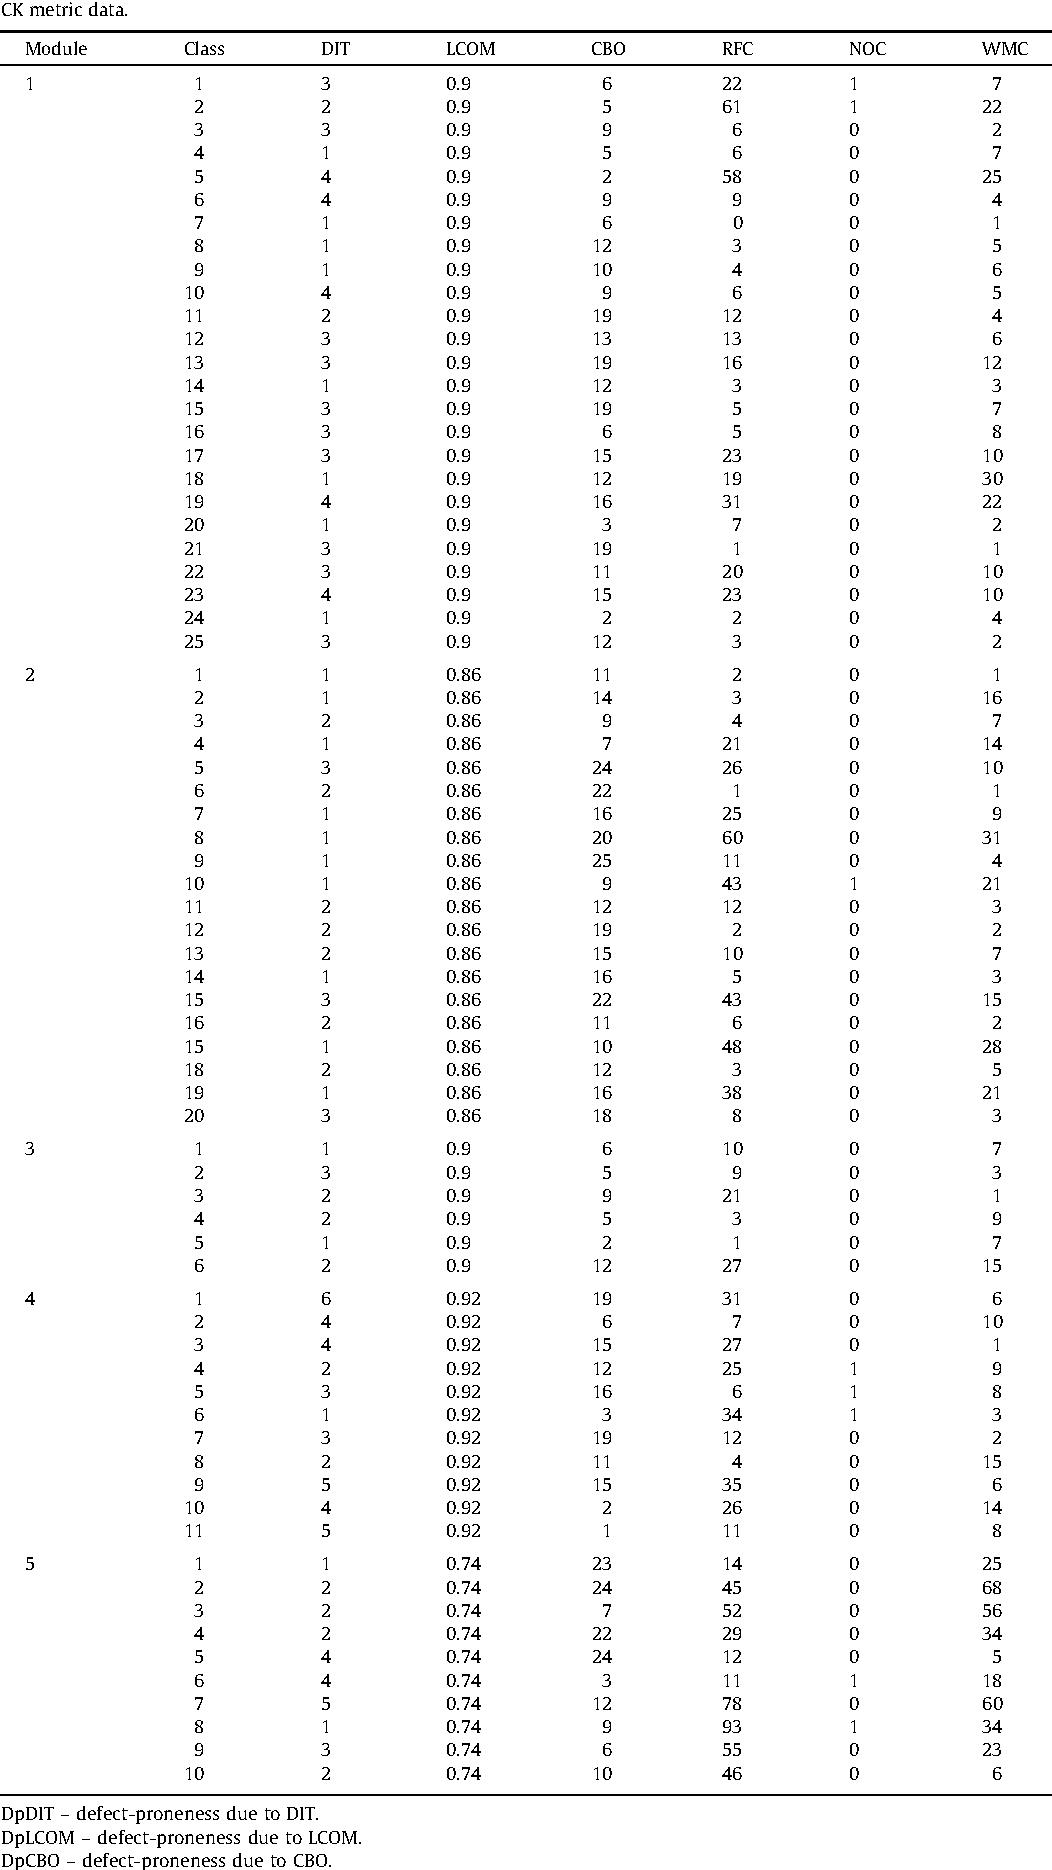 Table 6 CK metric data.